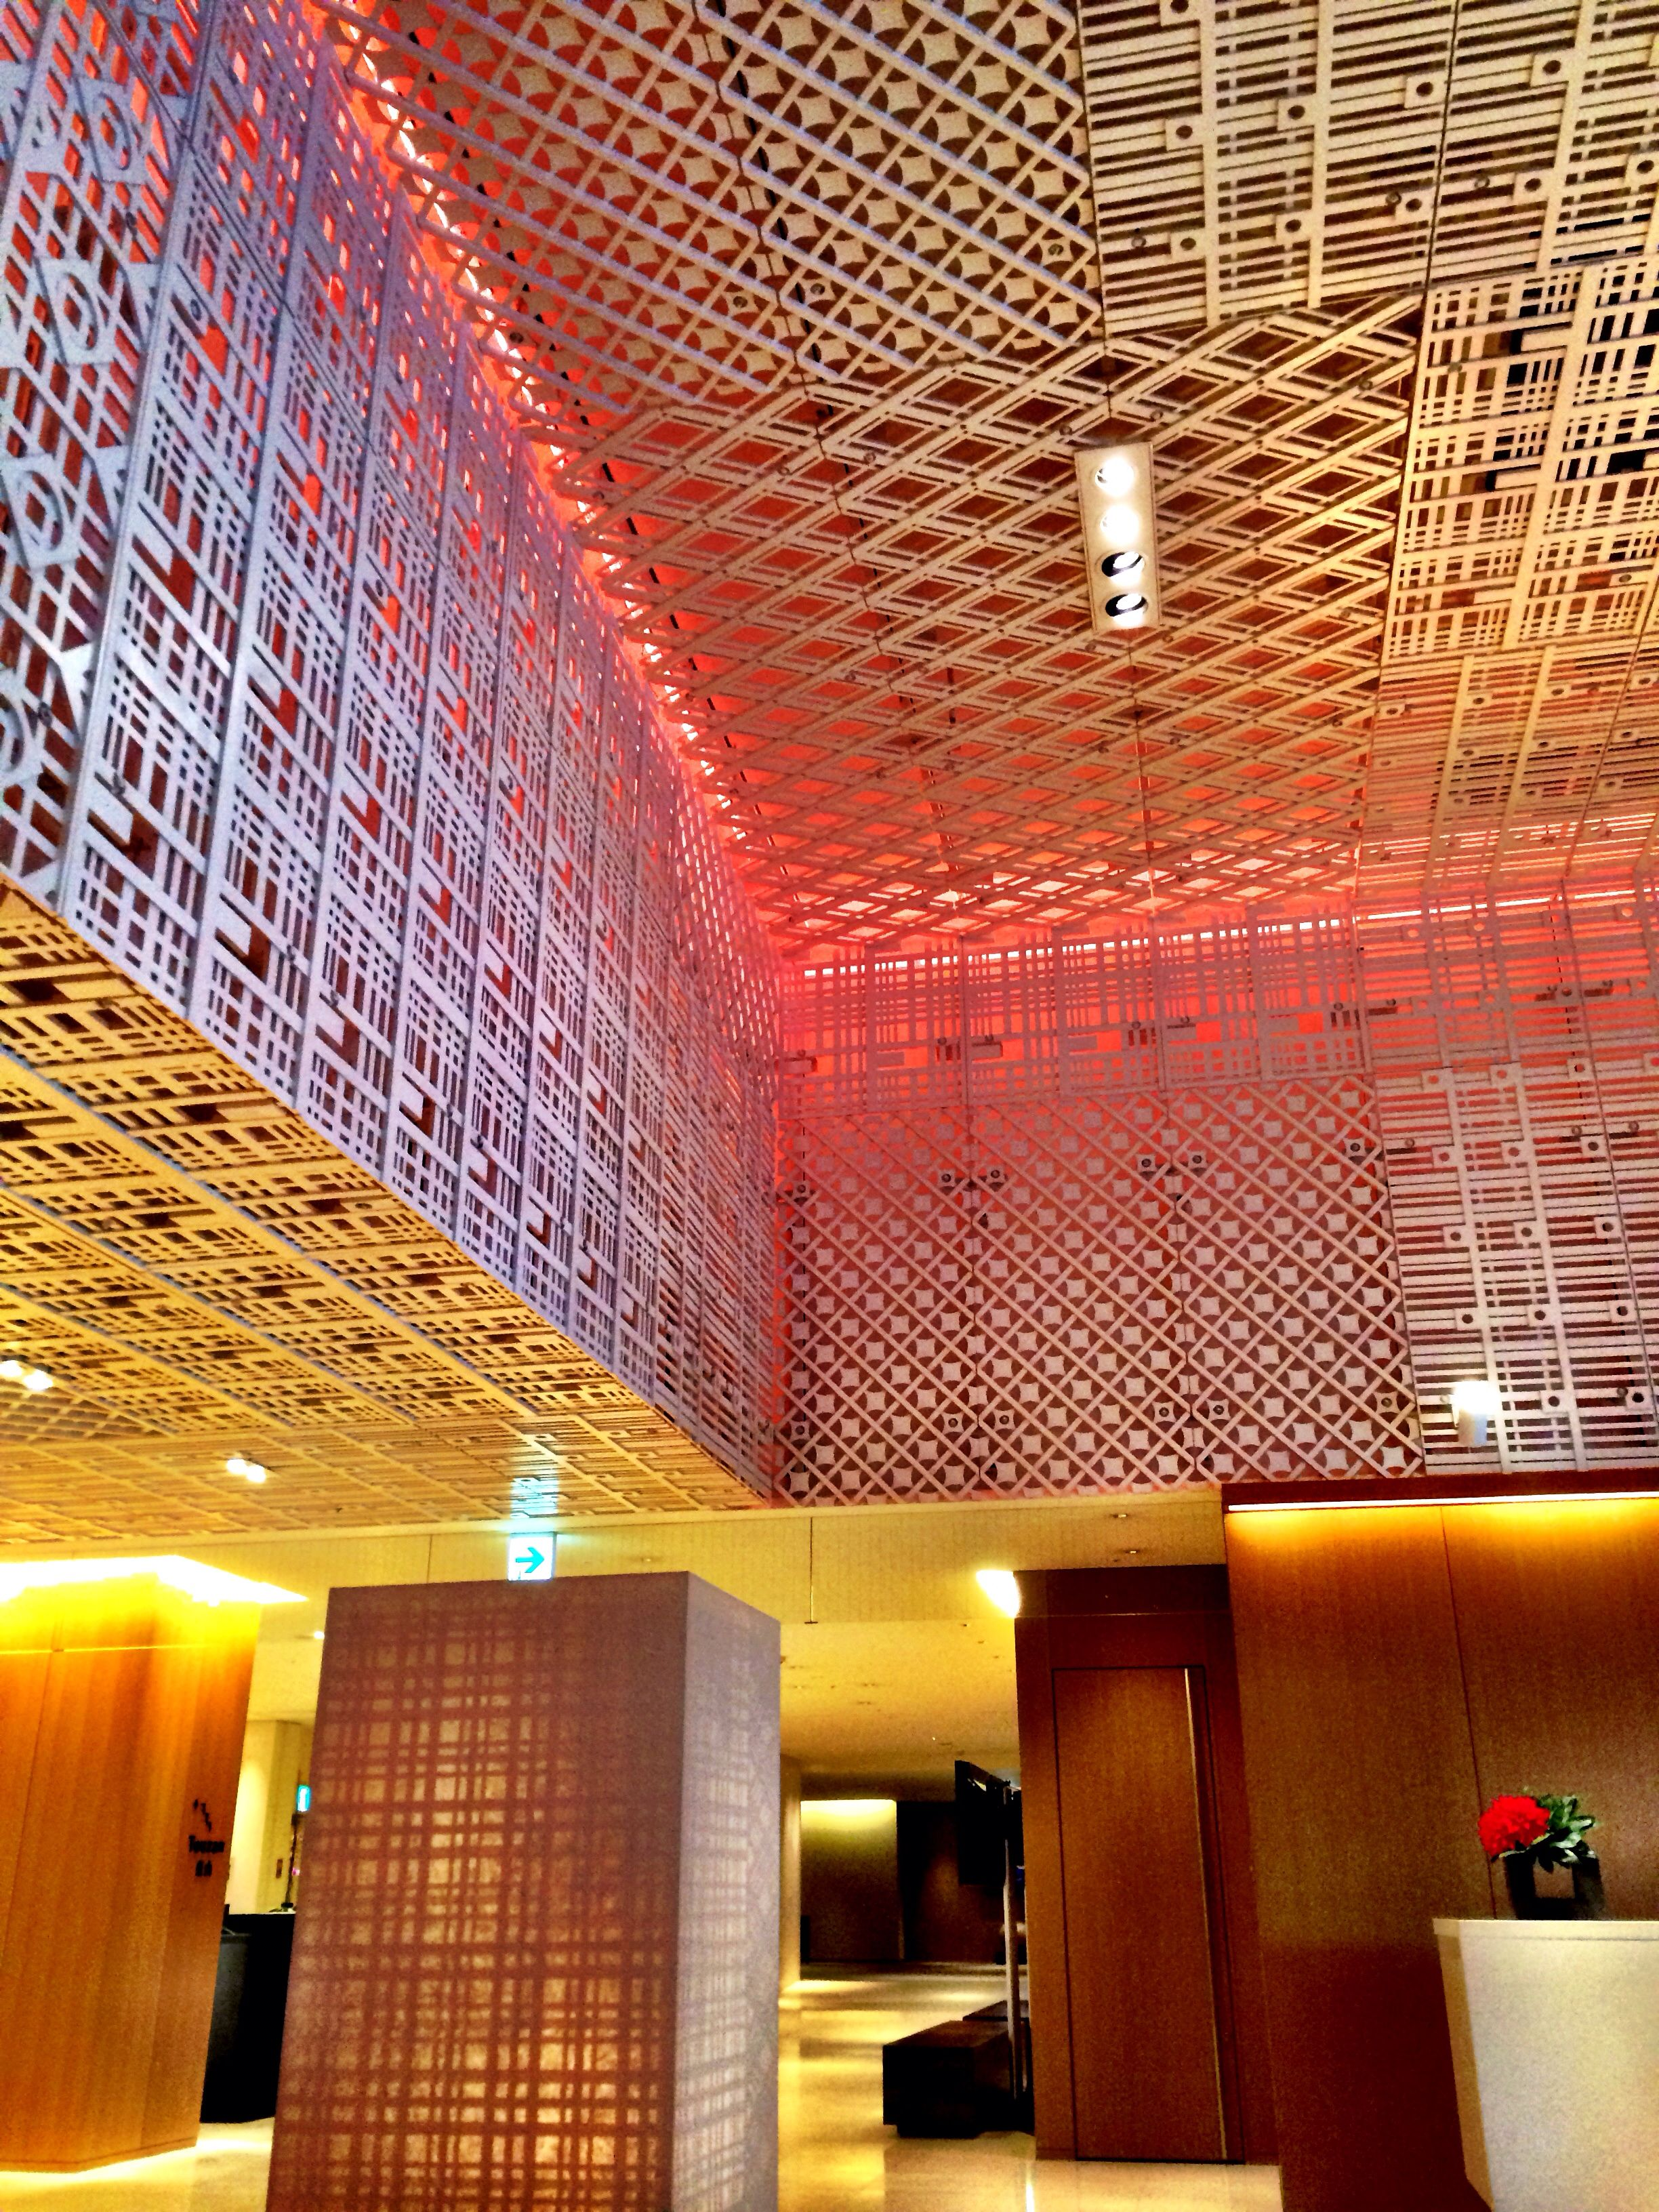 Hyatt regency kyoto lobby designed by super potato sax for Design hotel kyoto